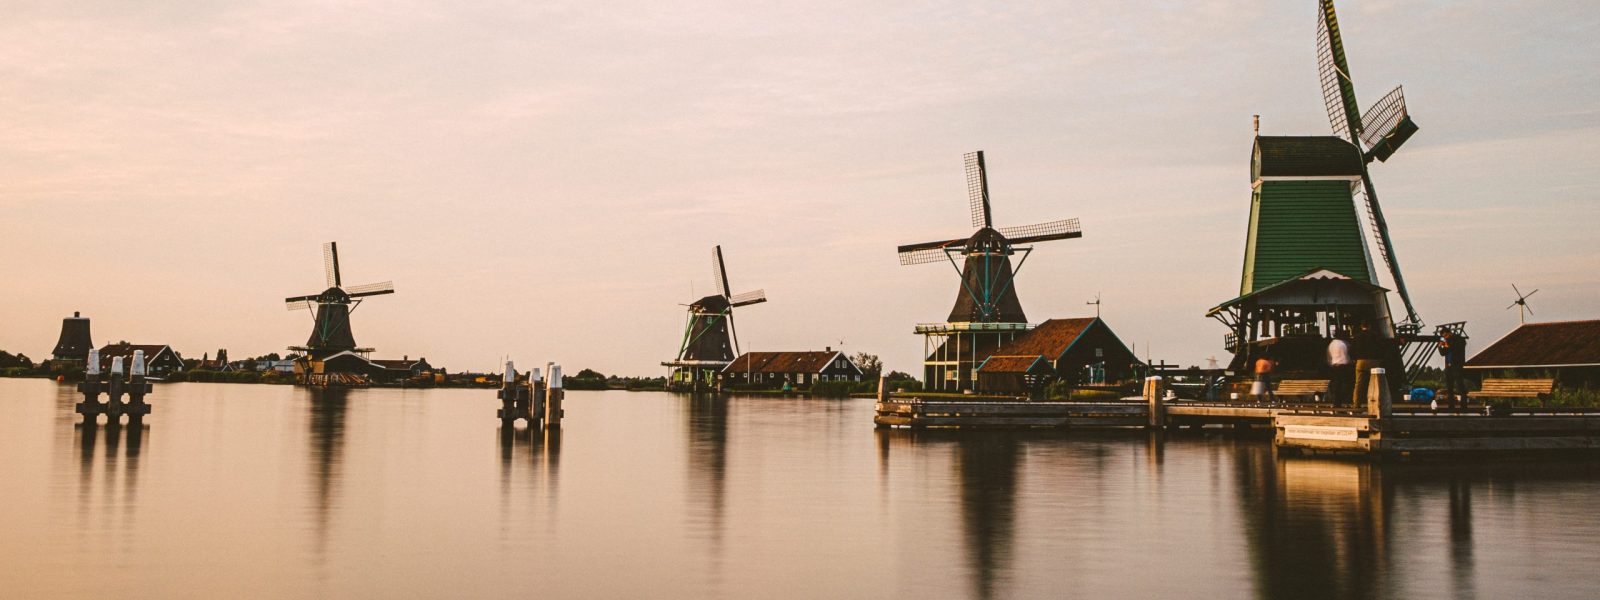 Best place to see windmills in the Netherlands: Kinderdijk or Zaanse Schans?